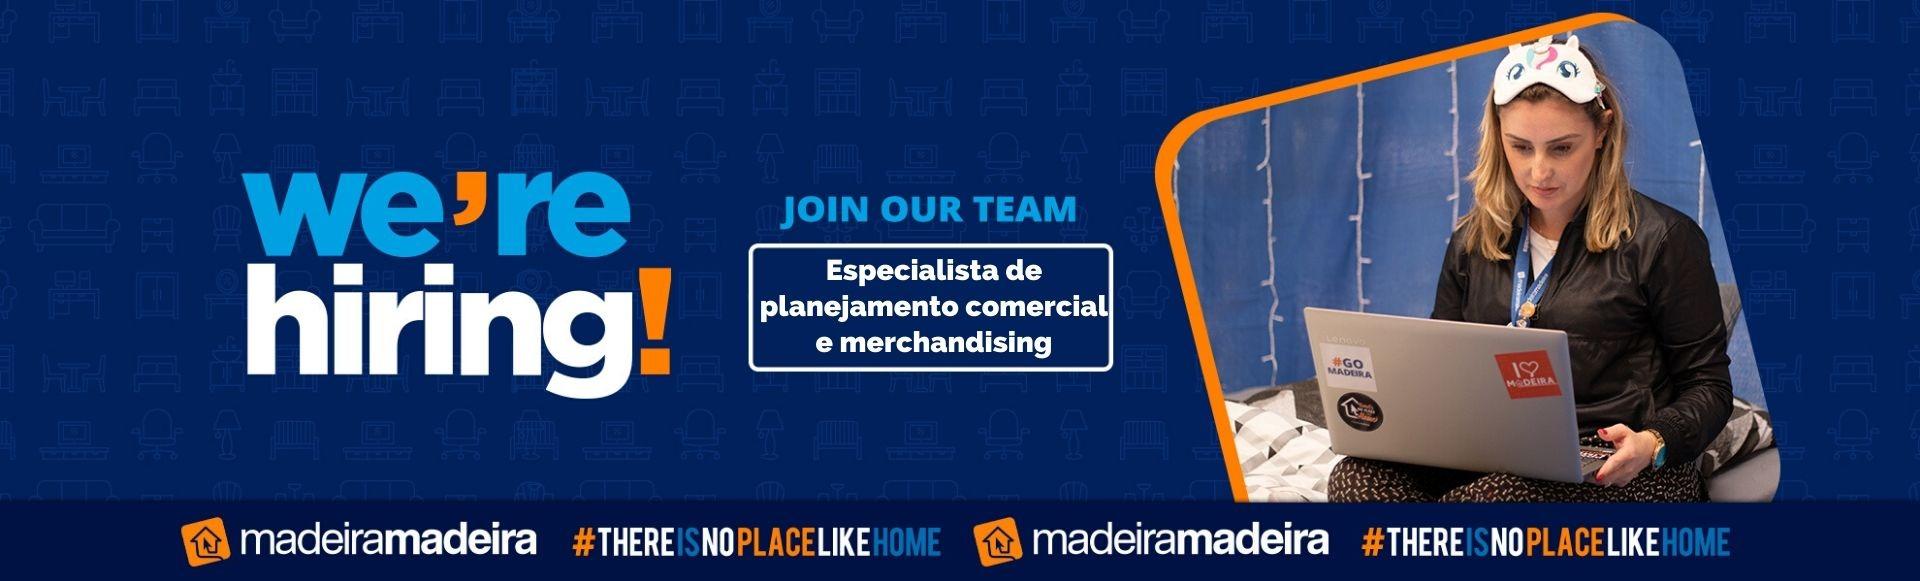 Especialista de planejamento comercial e merchandising